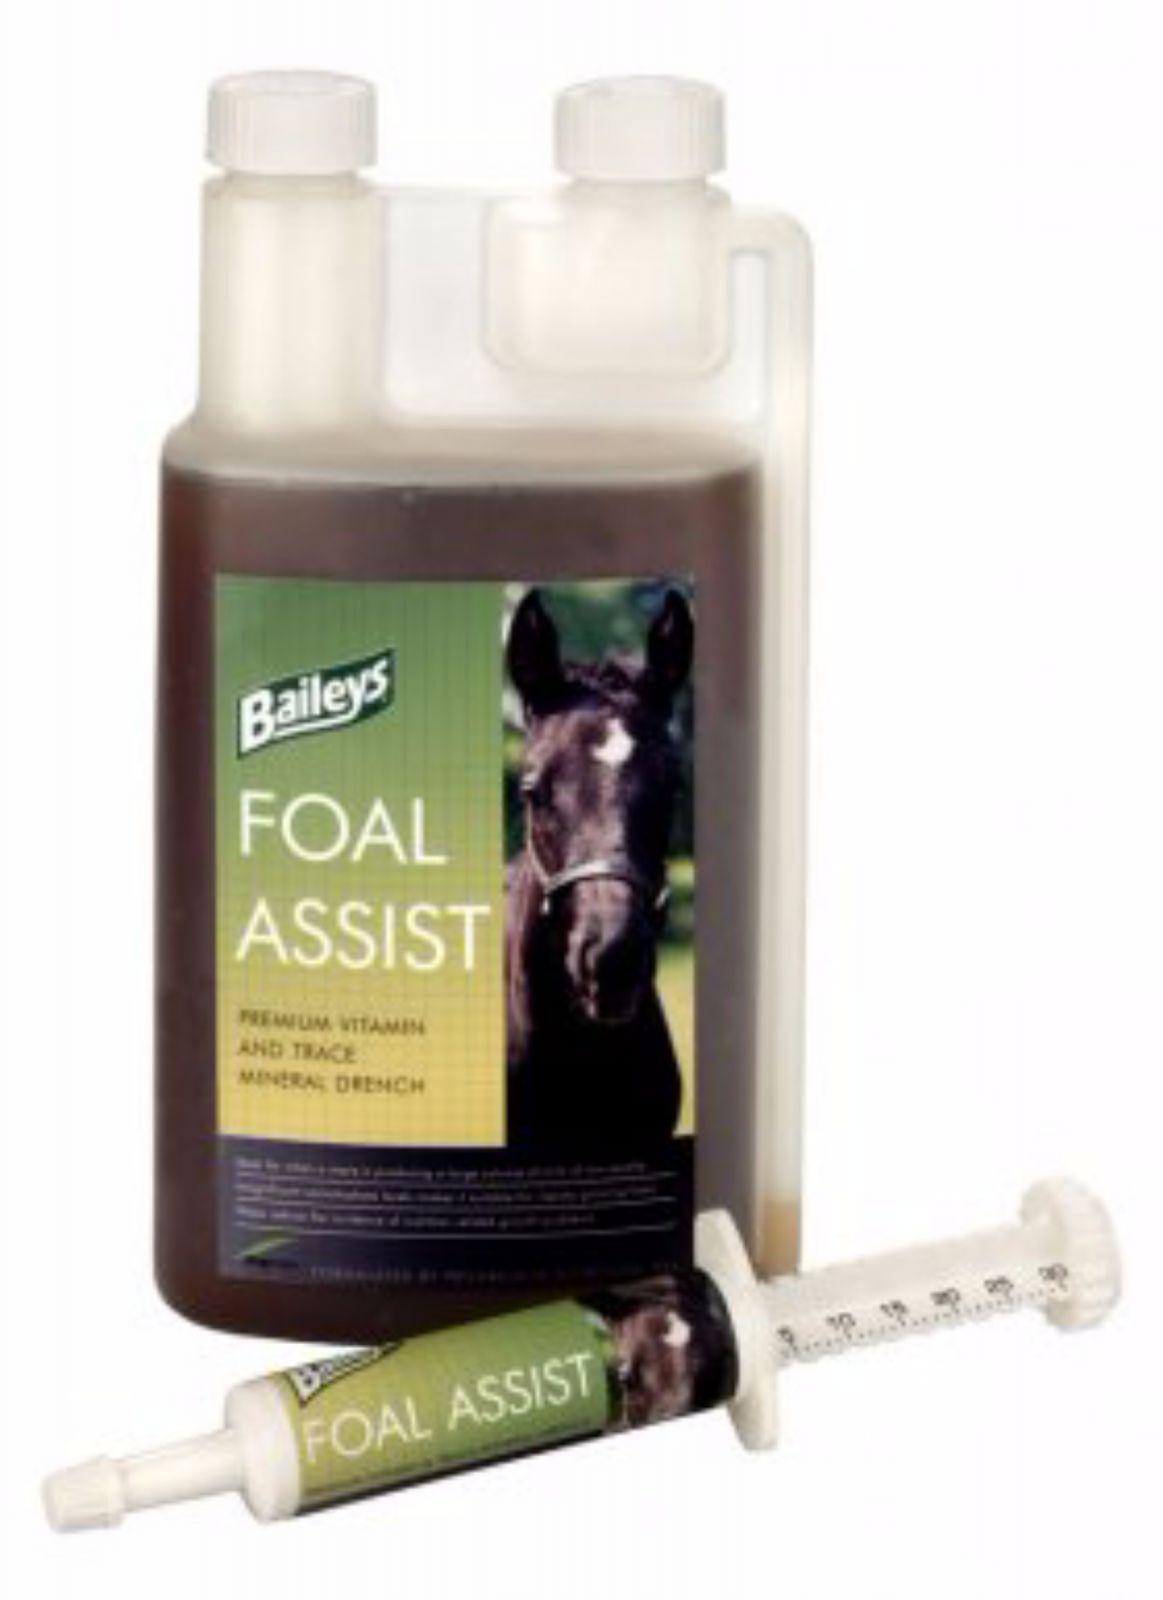 Baileys Foal Assist 1 Litre